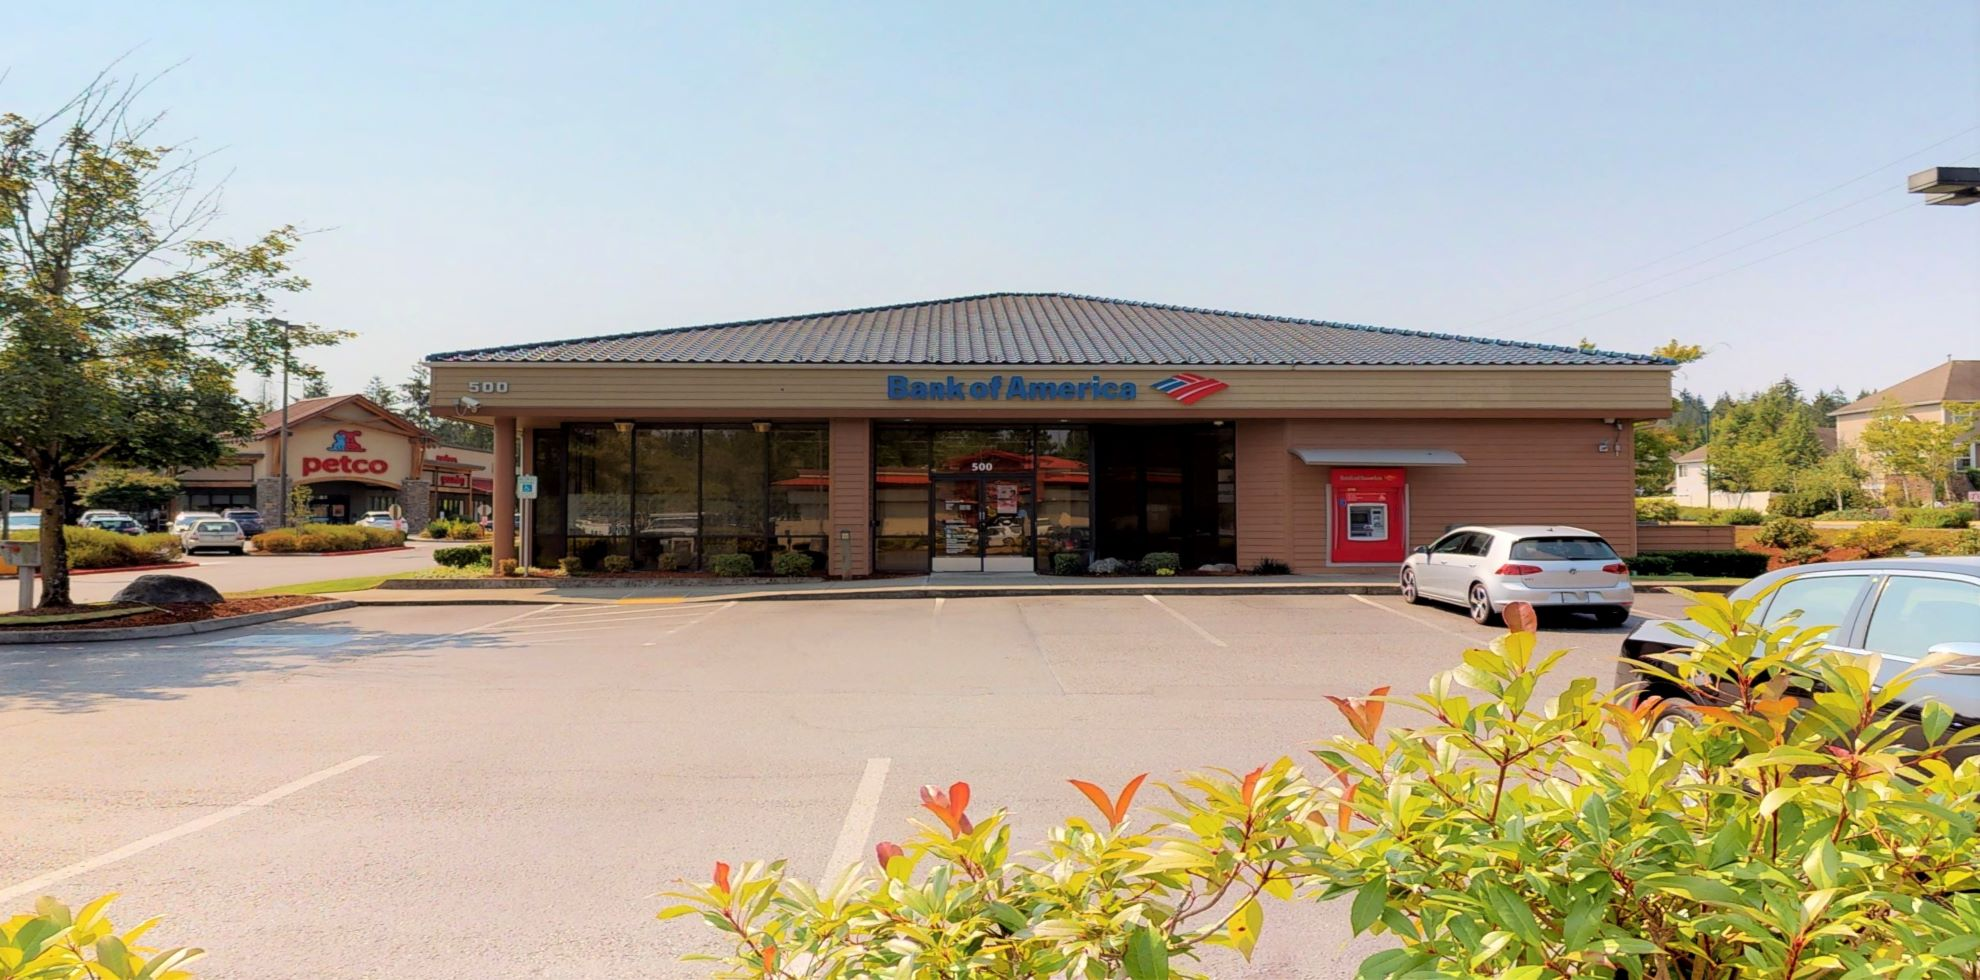 Bank of America financial center with drive-thru ATM | 500 228th Ave NE, Sammamish, WA 98074